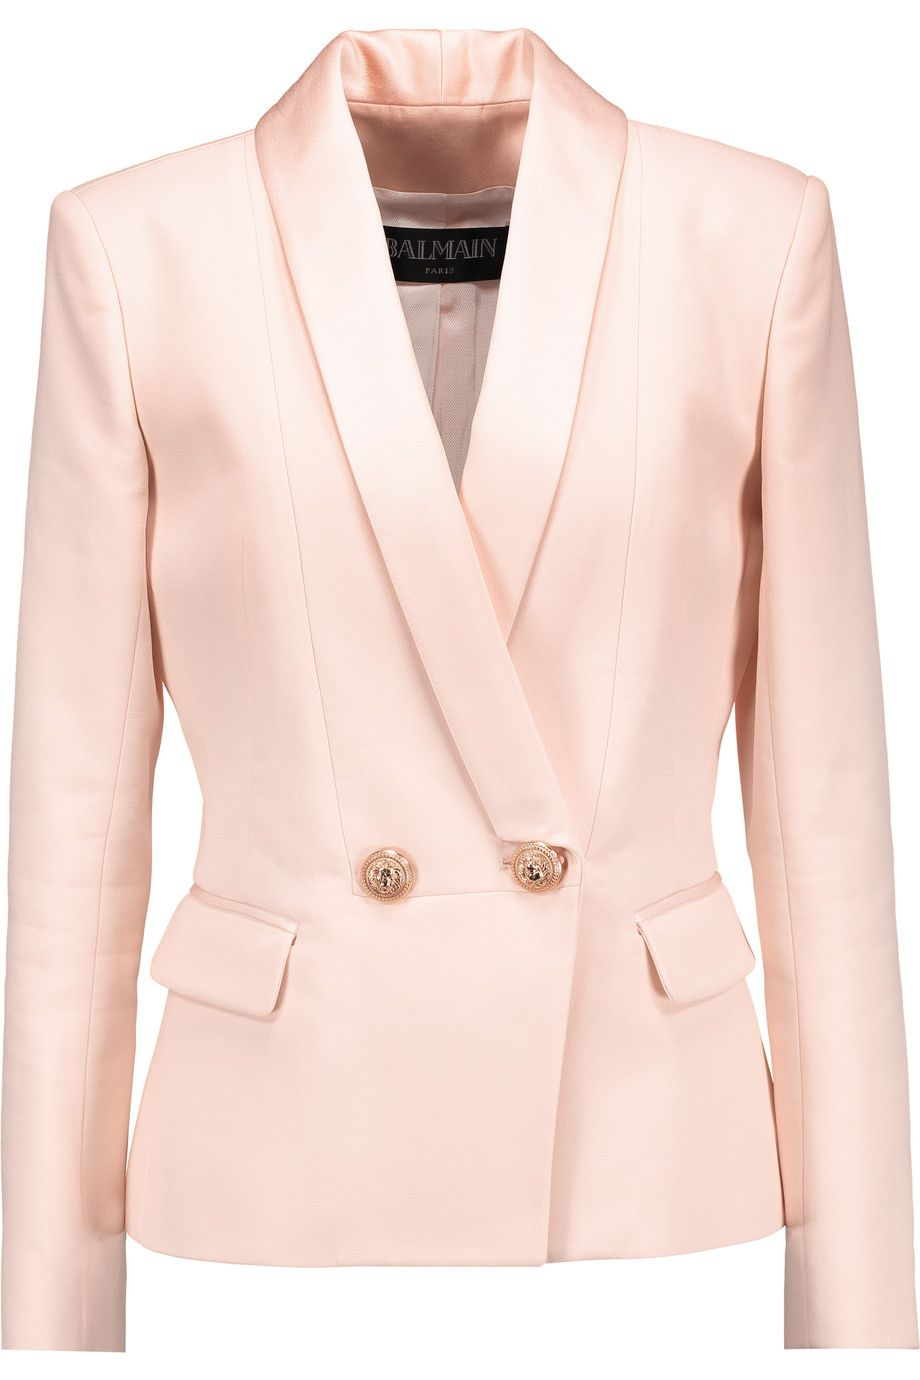 5f0f8a19c0 BALMAIN Crepe Blazer.  balmain  cloth  blazer